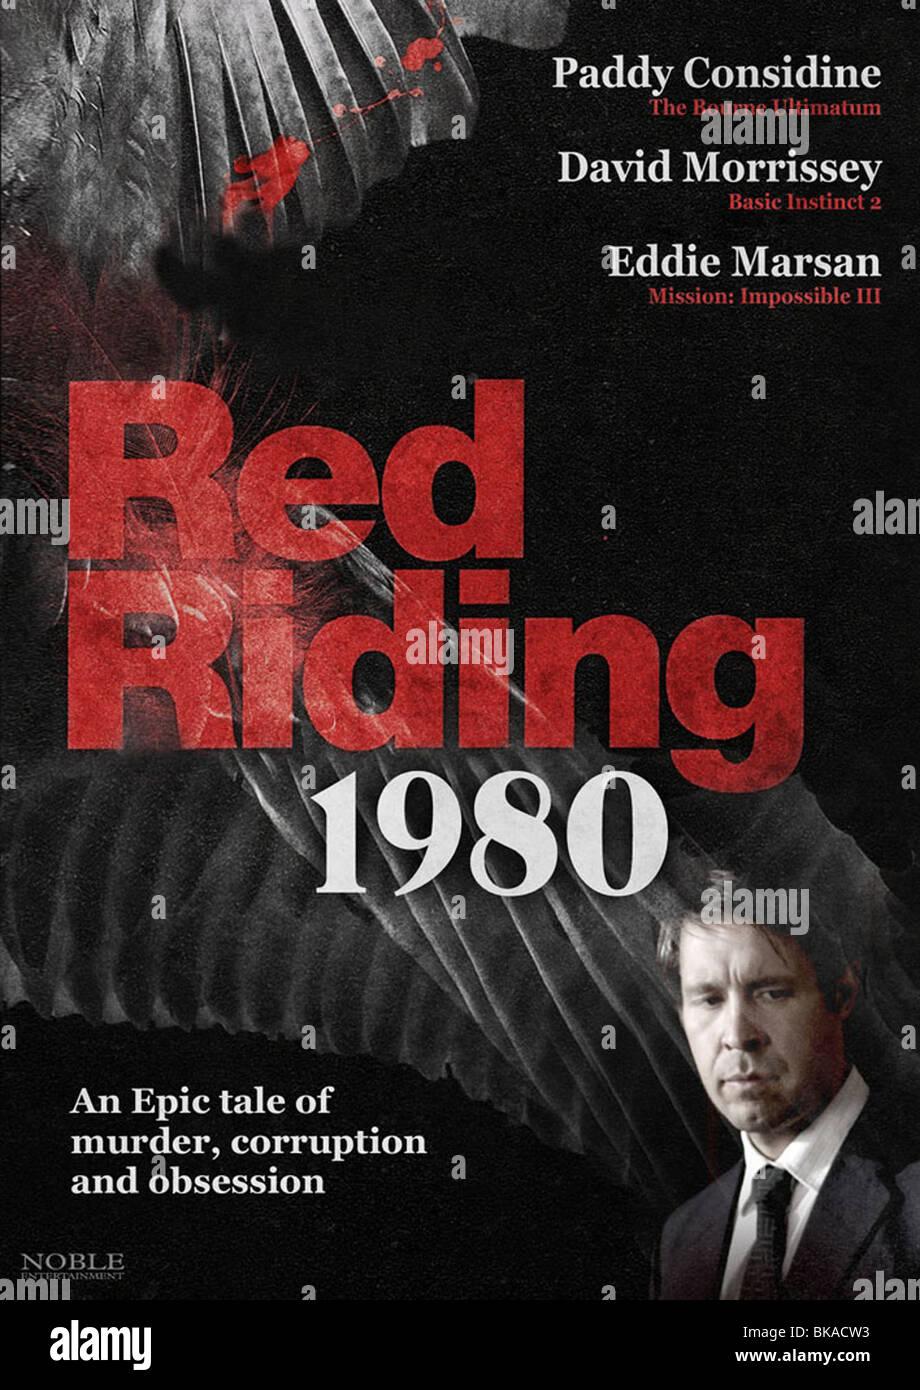 Red Riding: 1980 Year : 2009 UK Director : James Marsh Movie poster (UK) - Stock Image